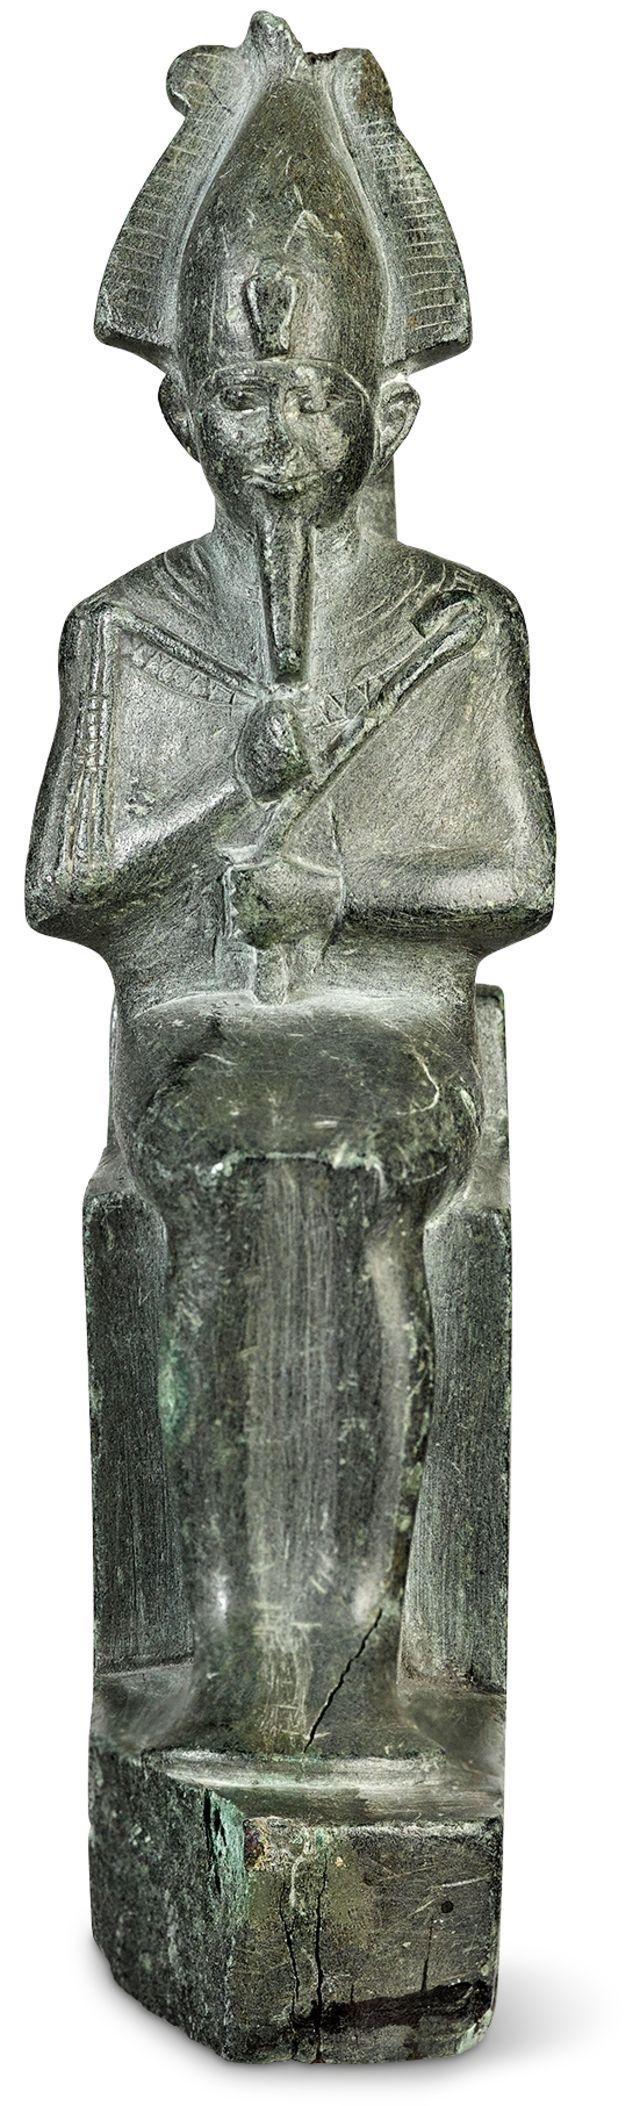 Ancient Egyptians Quiz | Quiz About Egypt | DK Find Out